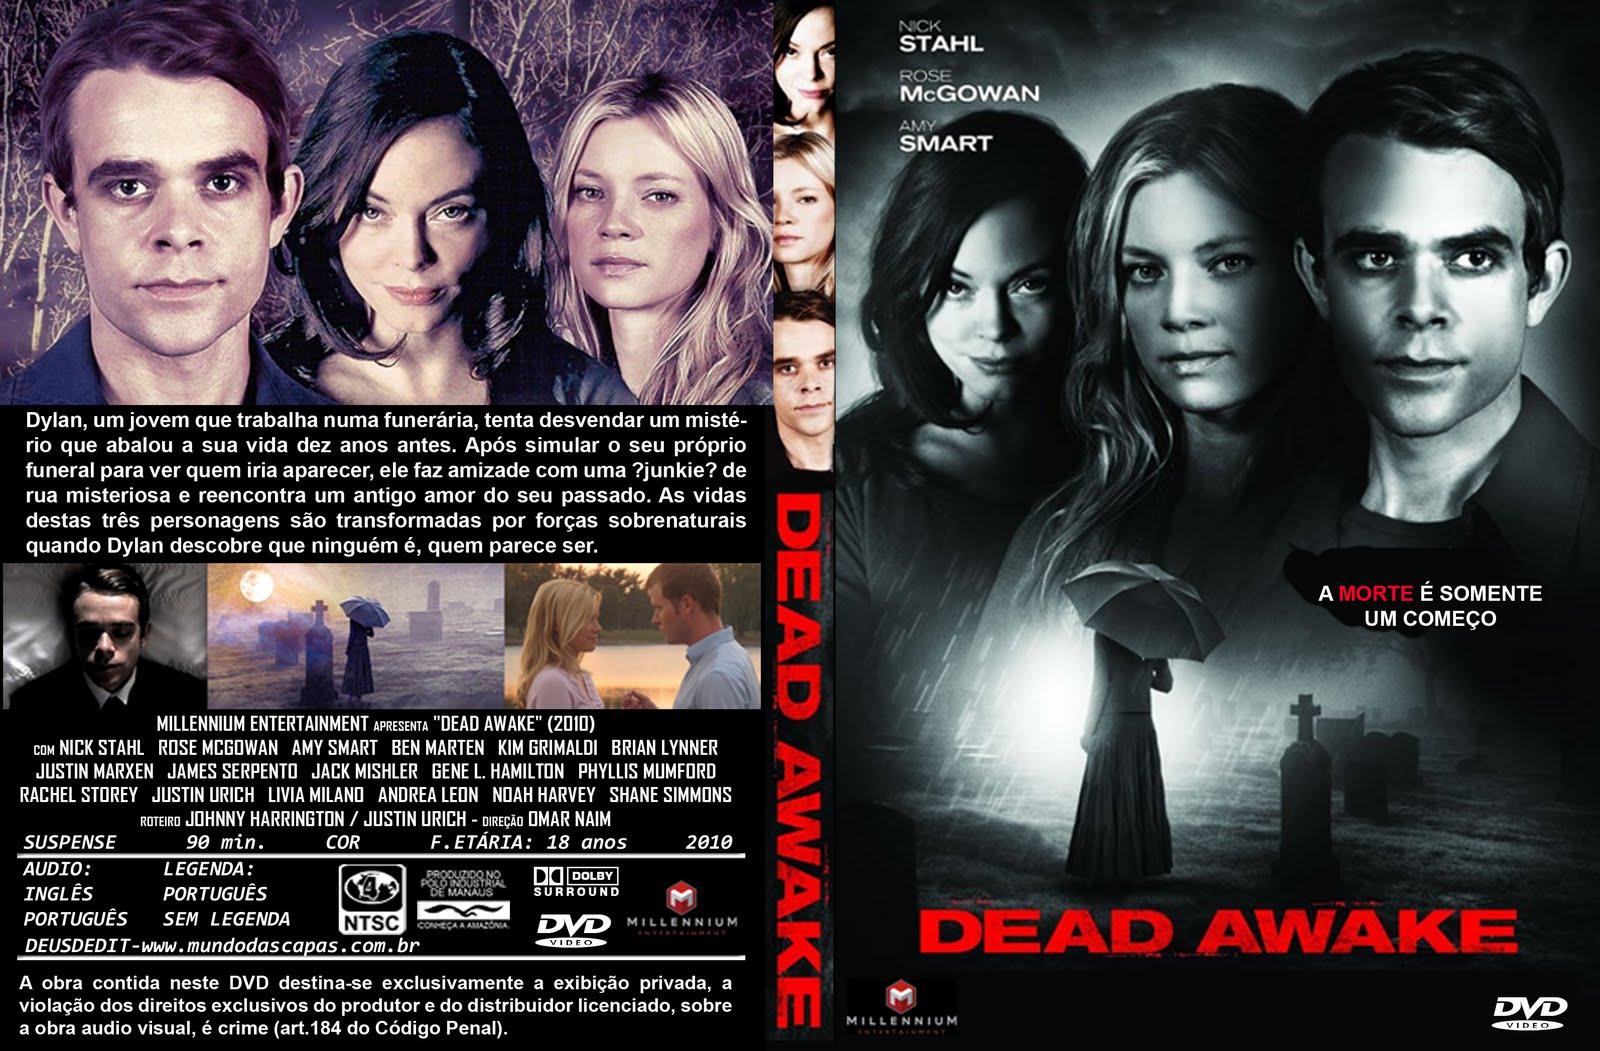 http://2.bp.blogspot.com/-JkrIa6UUFLI/TfdlsxQlVNI/AAAAAAAAAu8/BoJa0YVQebo/s1600/Dead_Awake.jpg